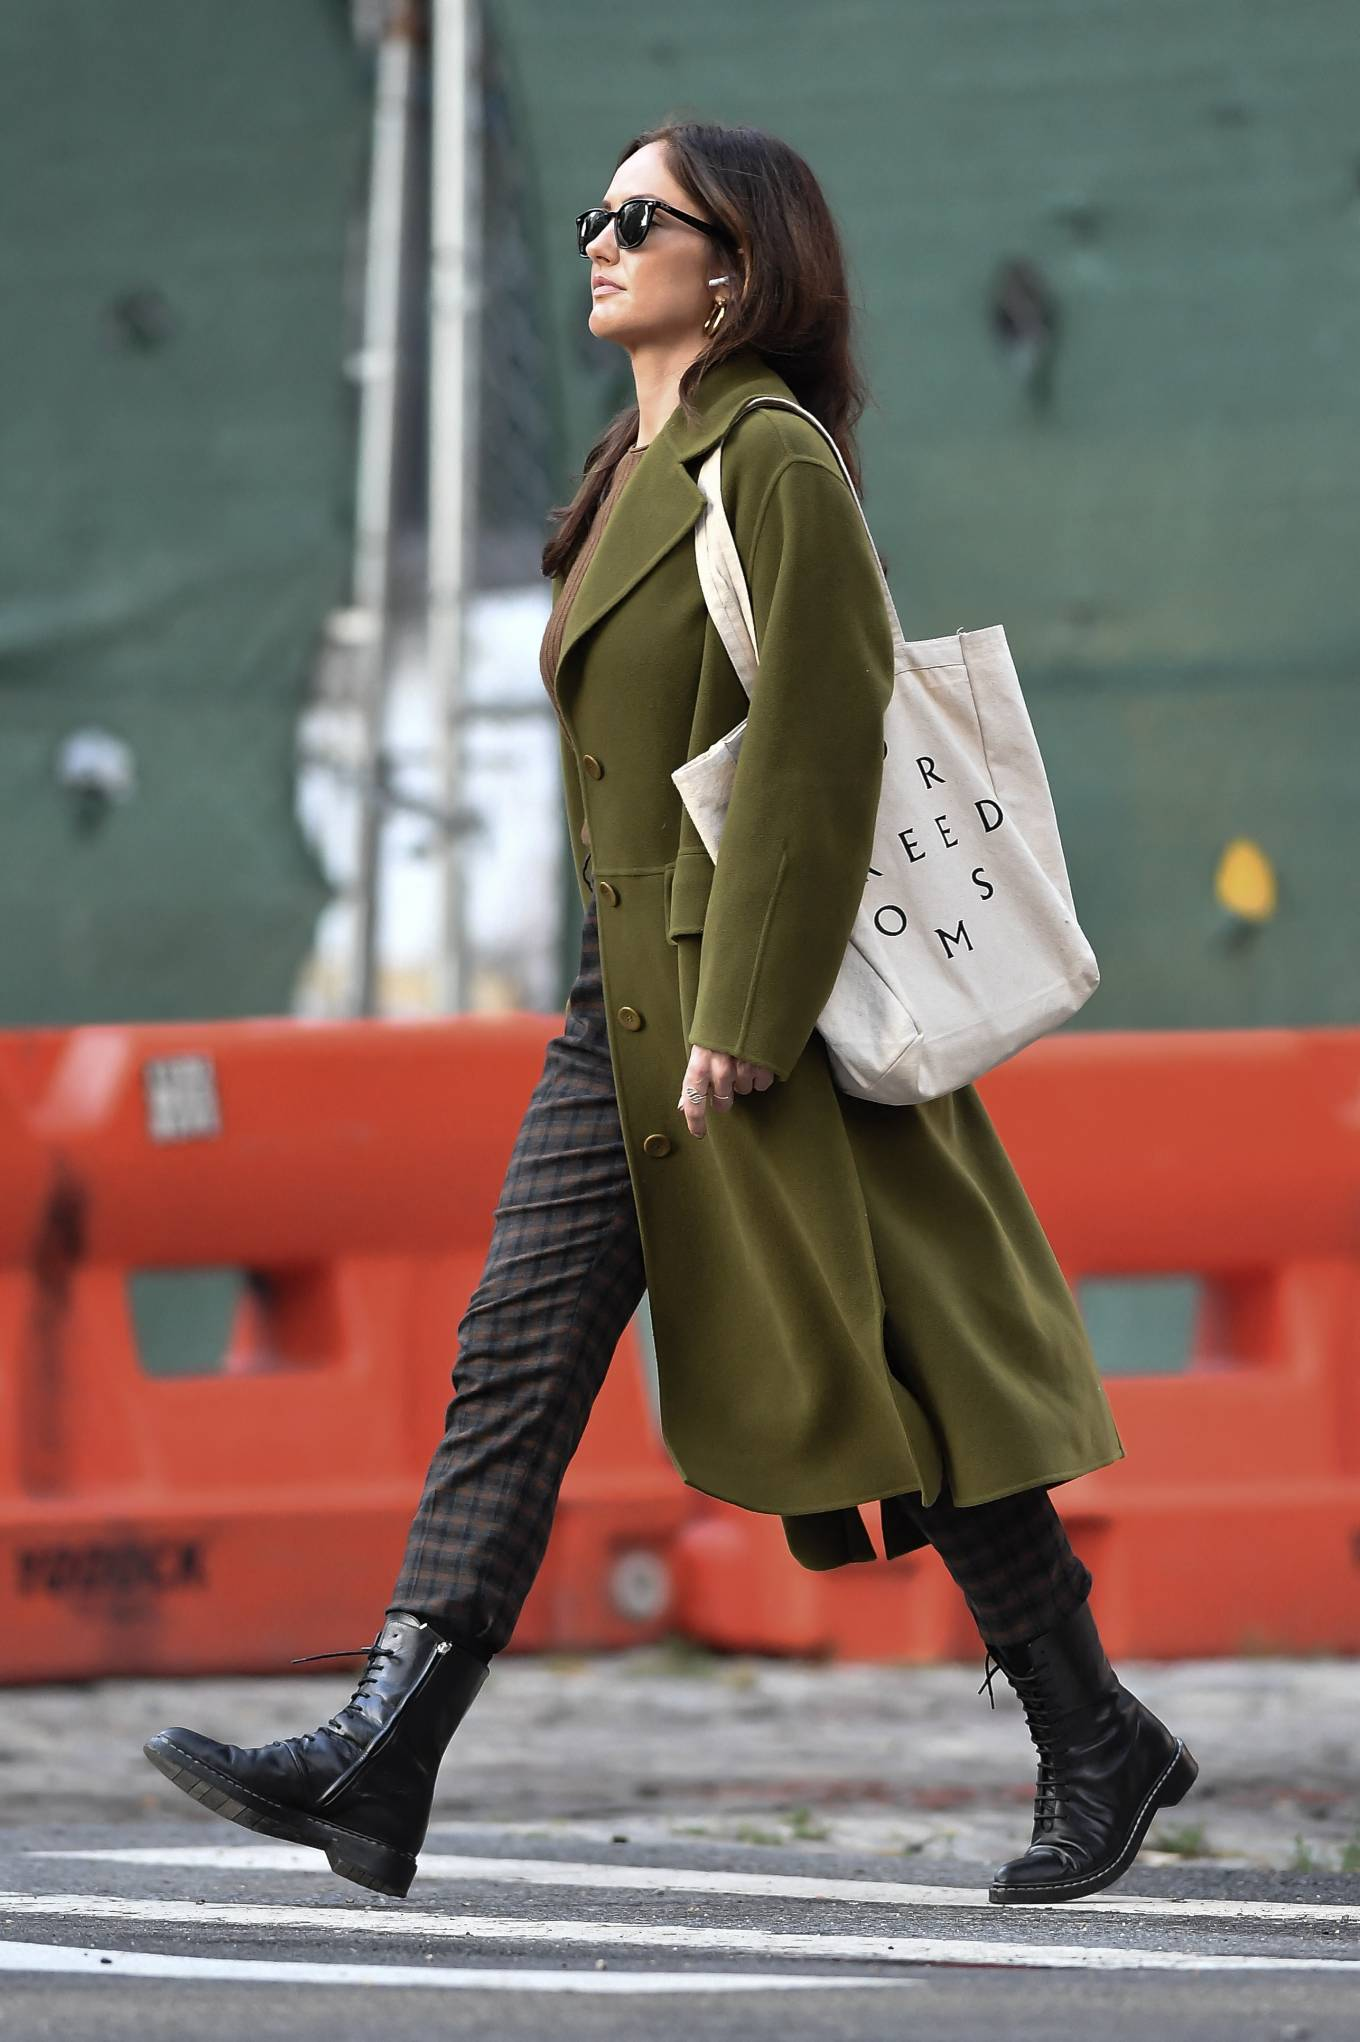 Minka Kelly 2021 : Minka Kelly – In olive green runs errands in New York-29